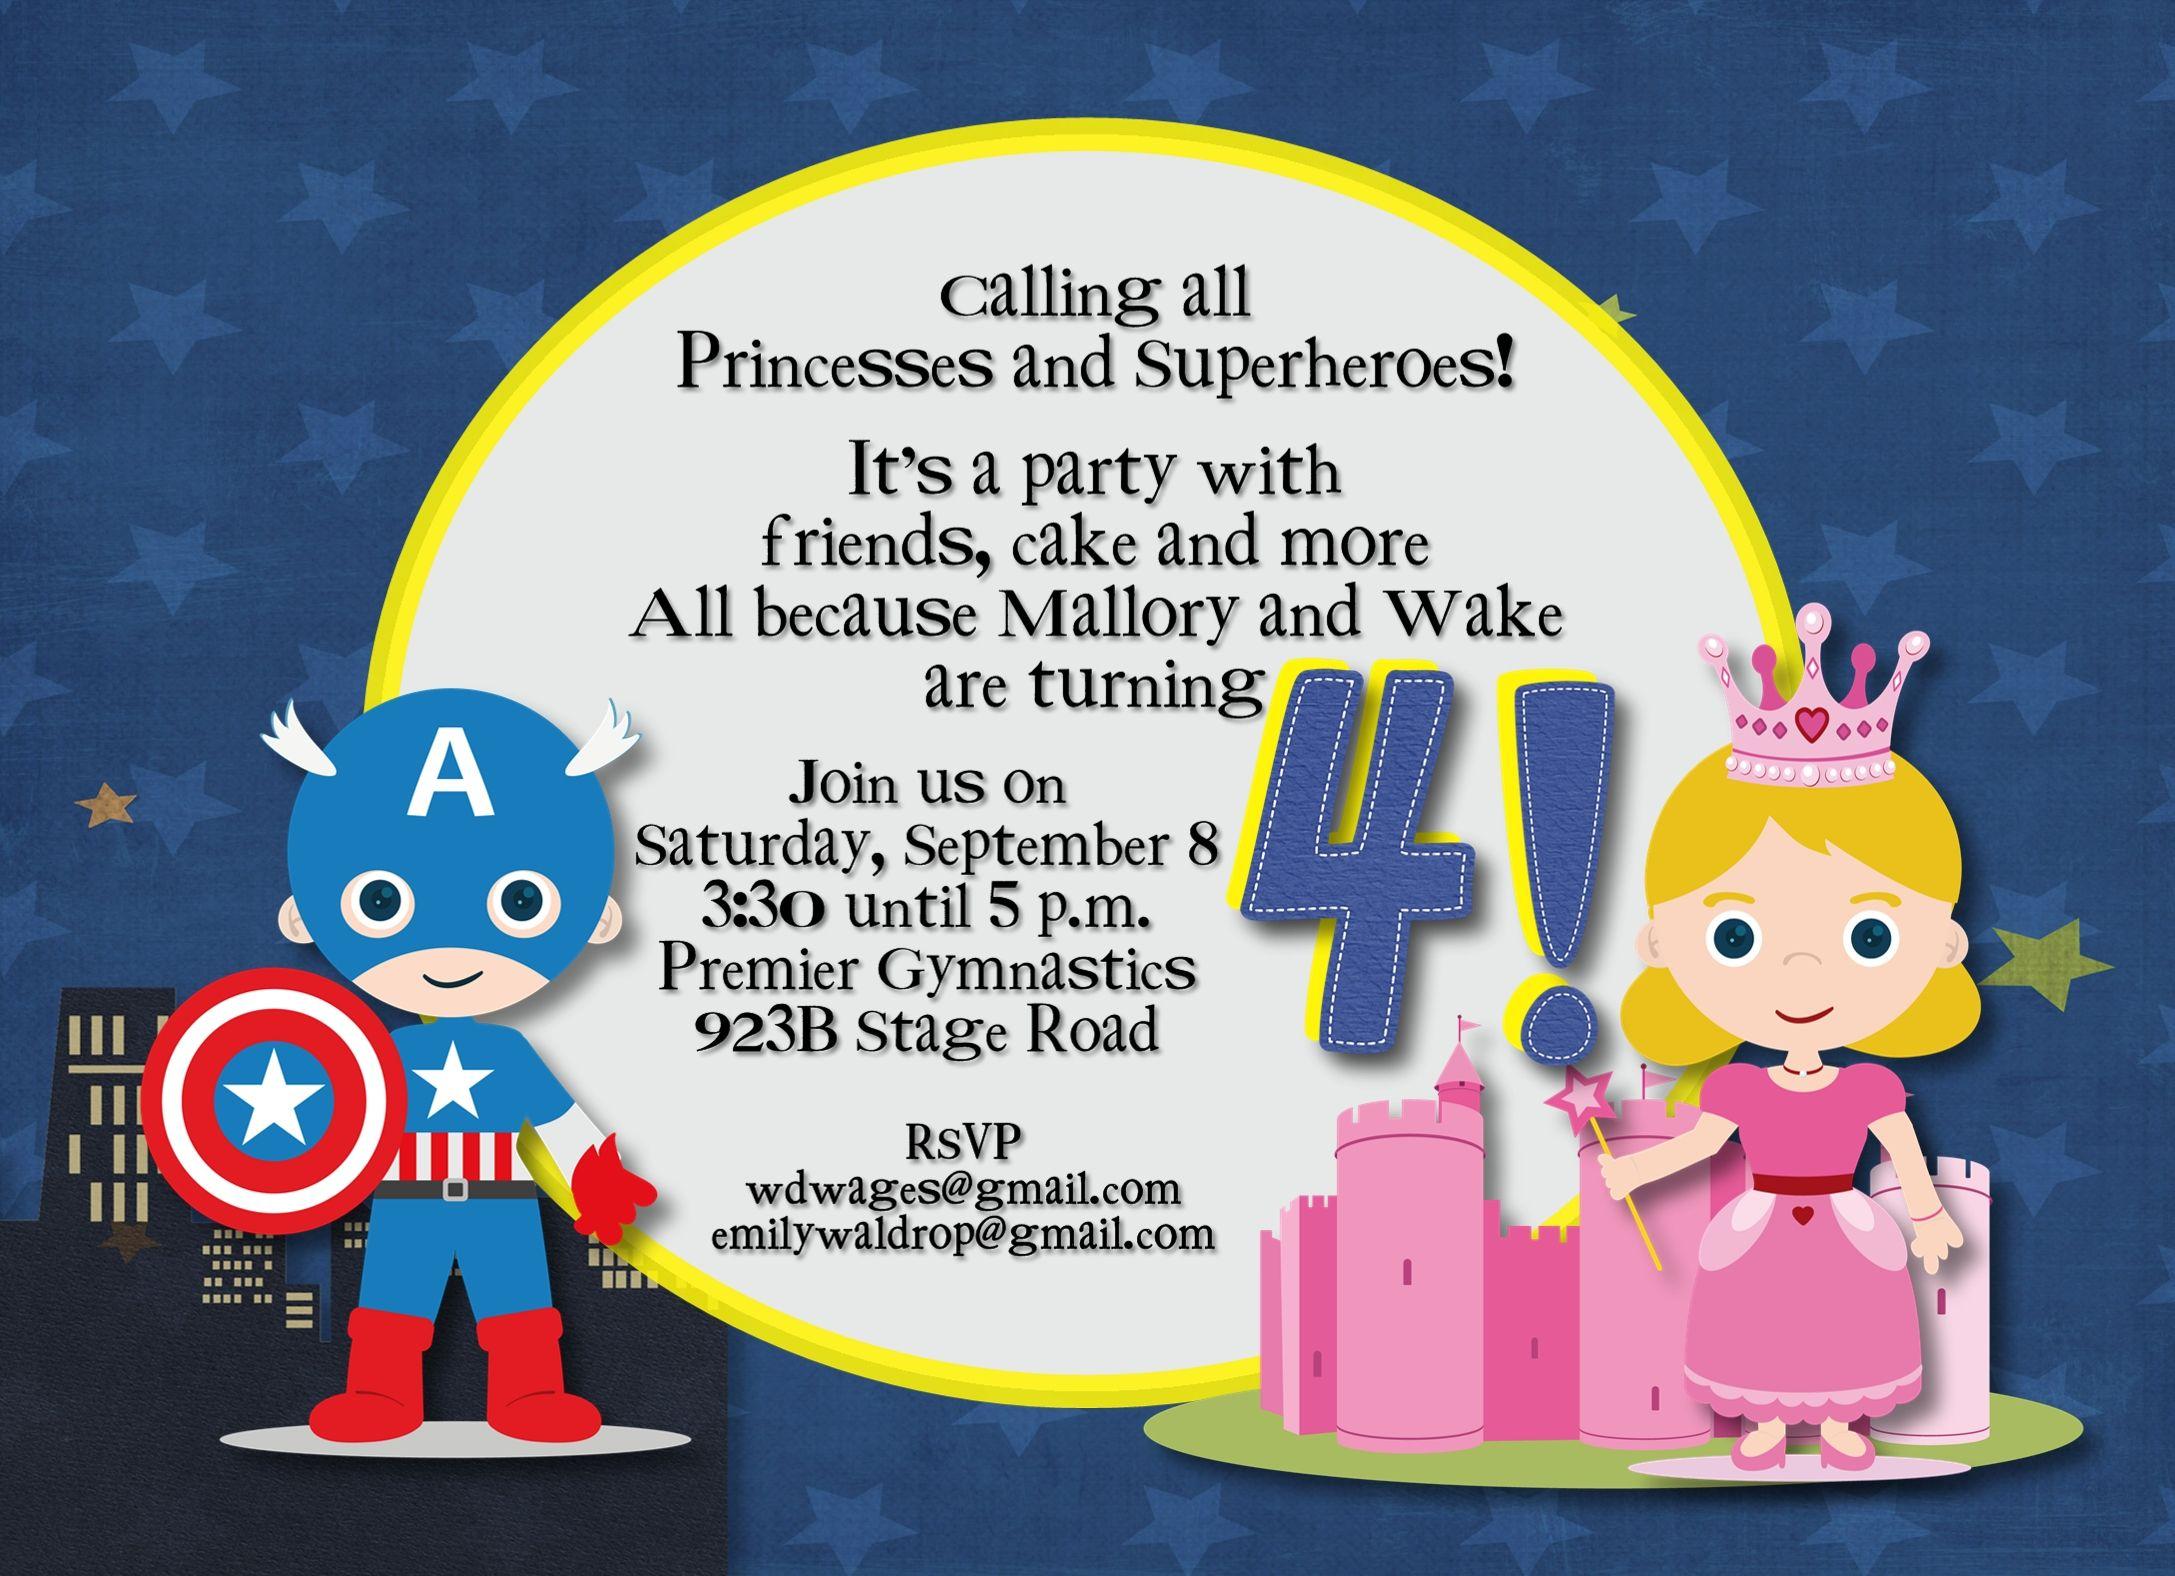 Superhero and Princess Party | WDWdesigns | Pinterest | Princess ...